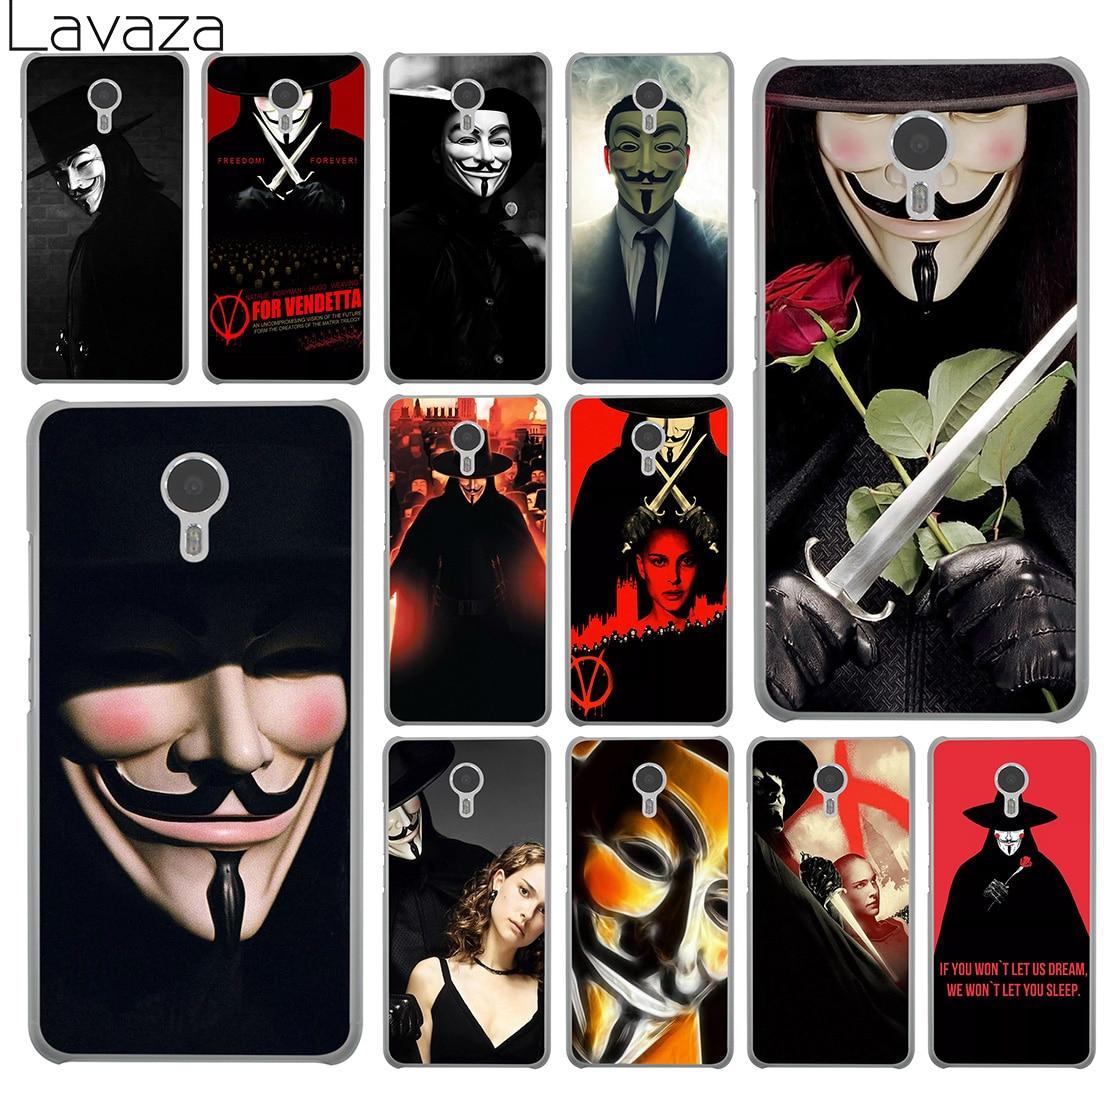 Lavaza <font><b>V</b></font> for Vendetta cd film Hard <font><b>Phone</b></font> Cover Case for Meizu M2 <font><b>M3</b></font> M3S M5 M5S Mini &#038; Note U10 U20 Pro 6